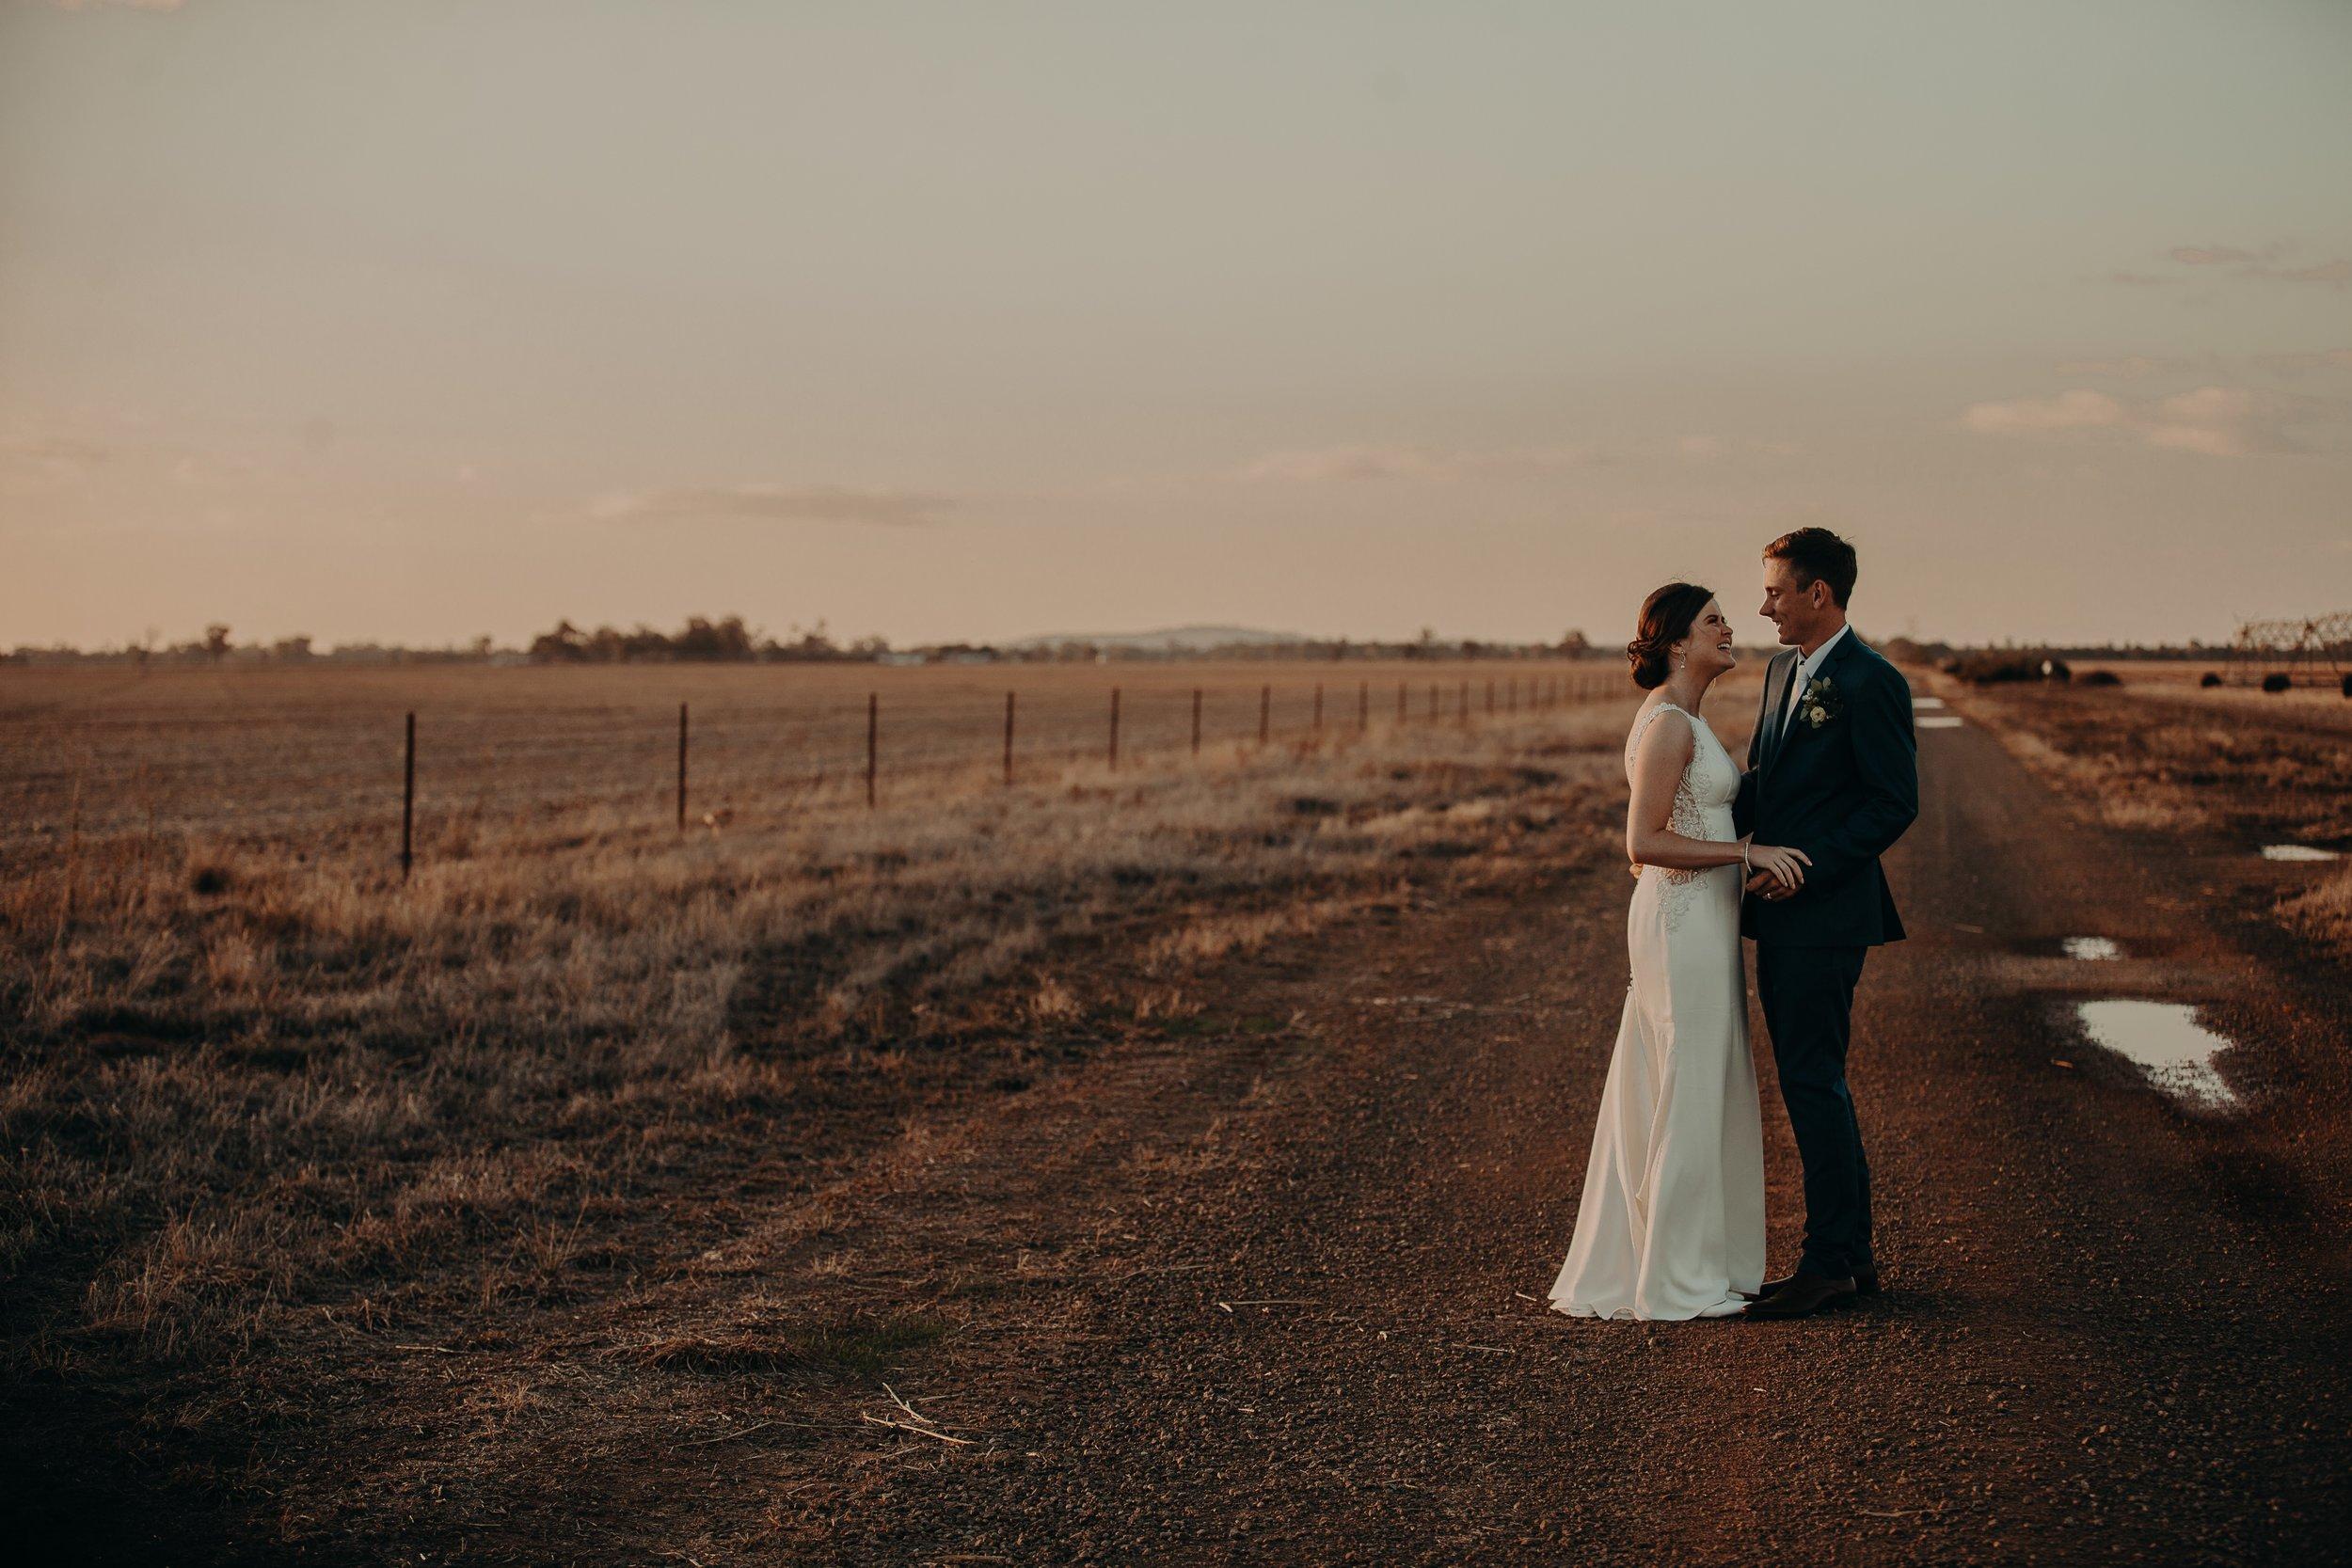 mickalathomas_puremacphotography_weddingphotographer_couplephotographer_Sheppartonphotographer_2565.jpg